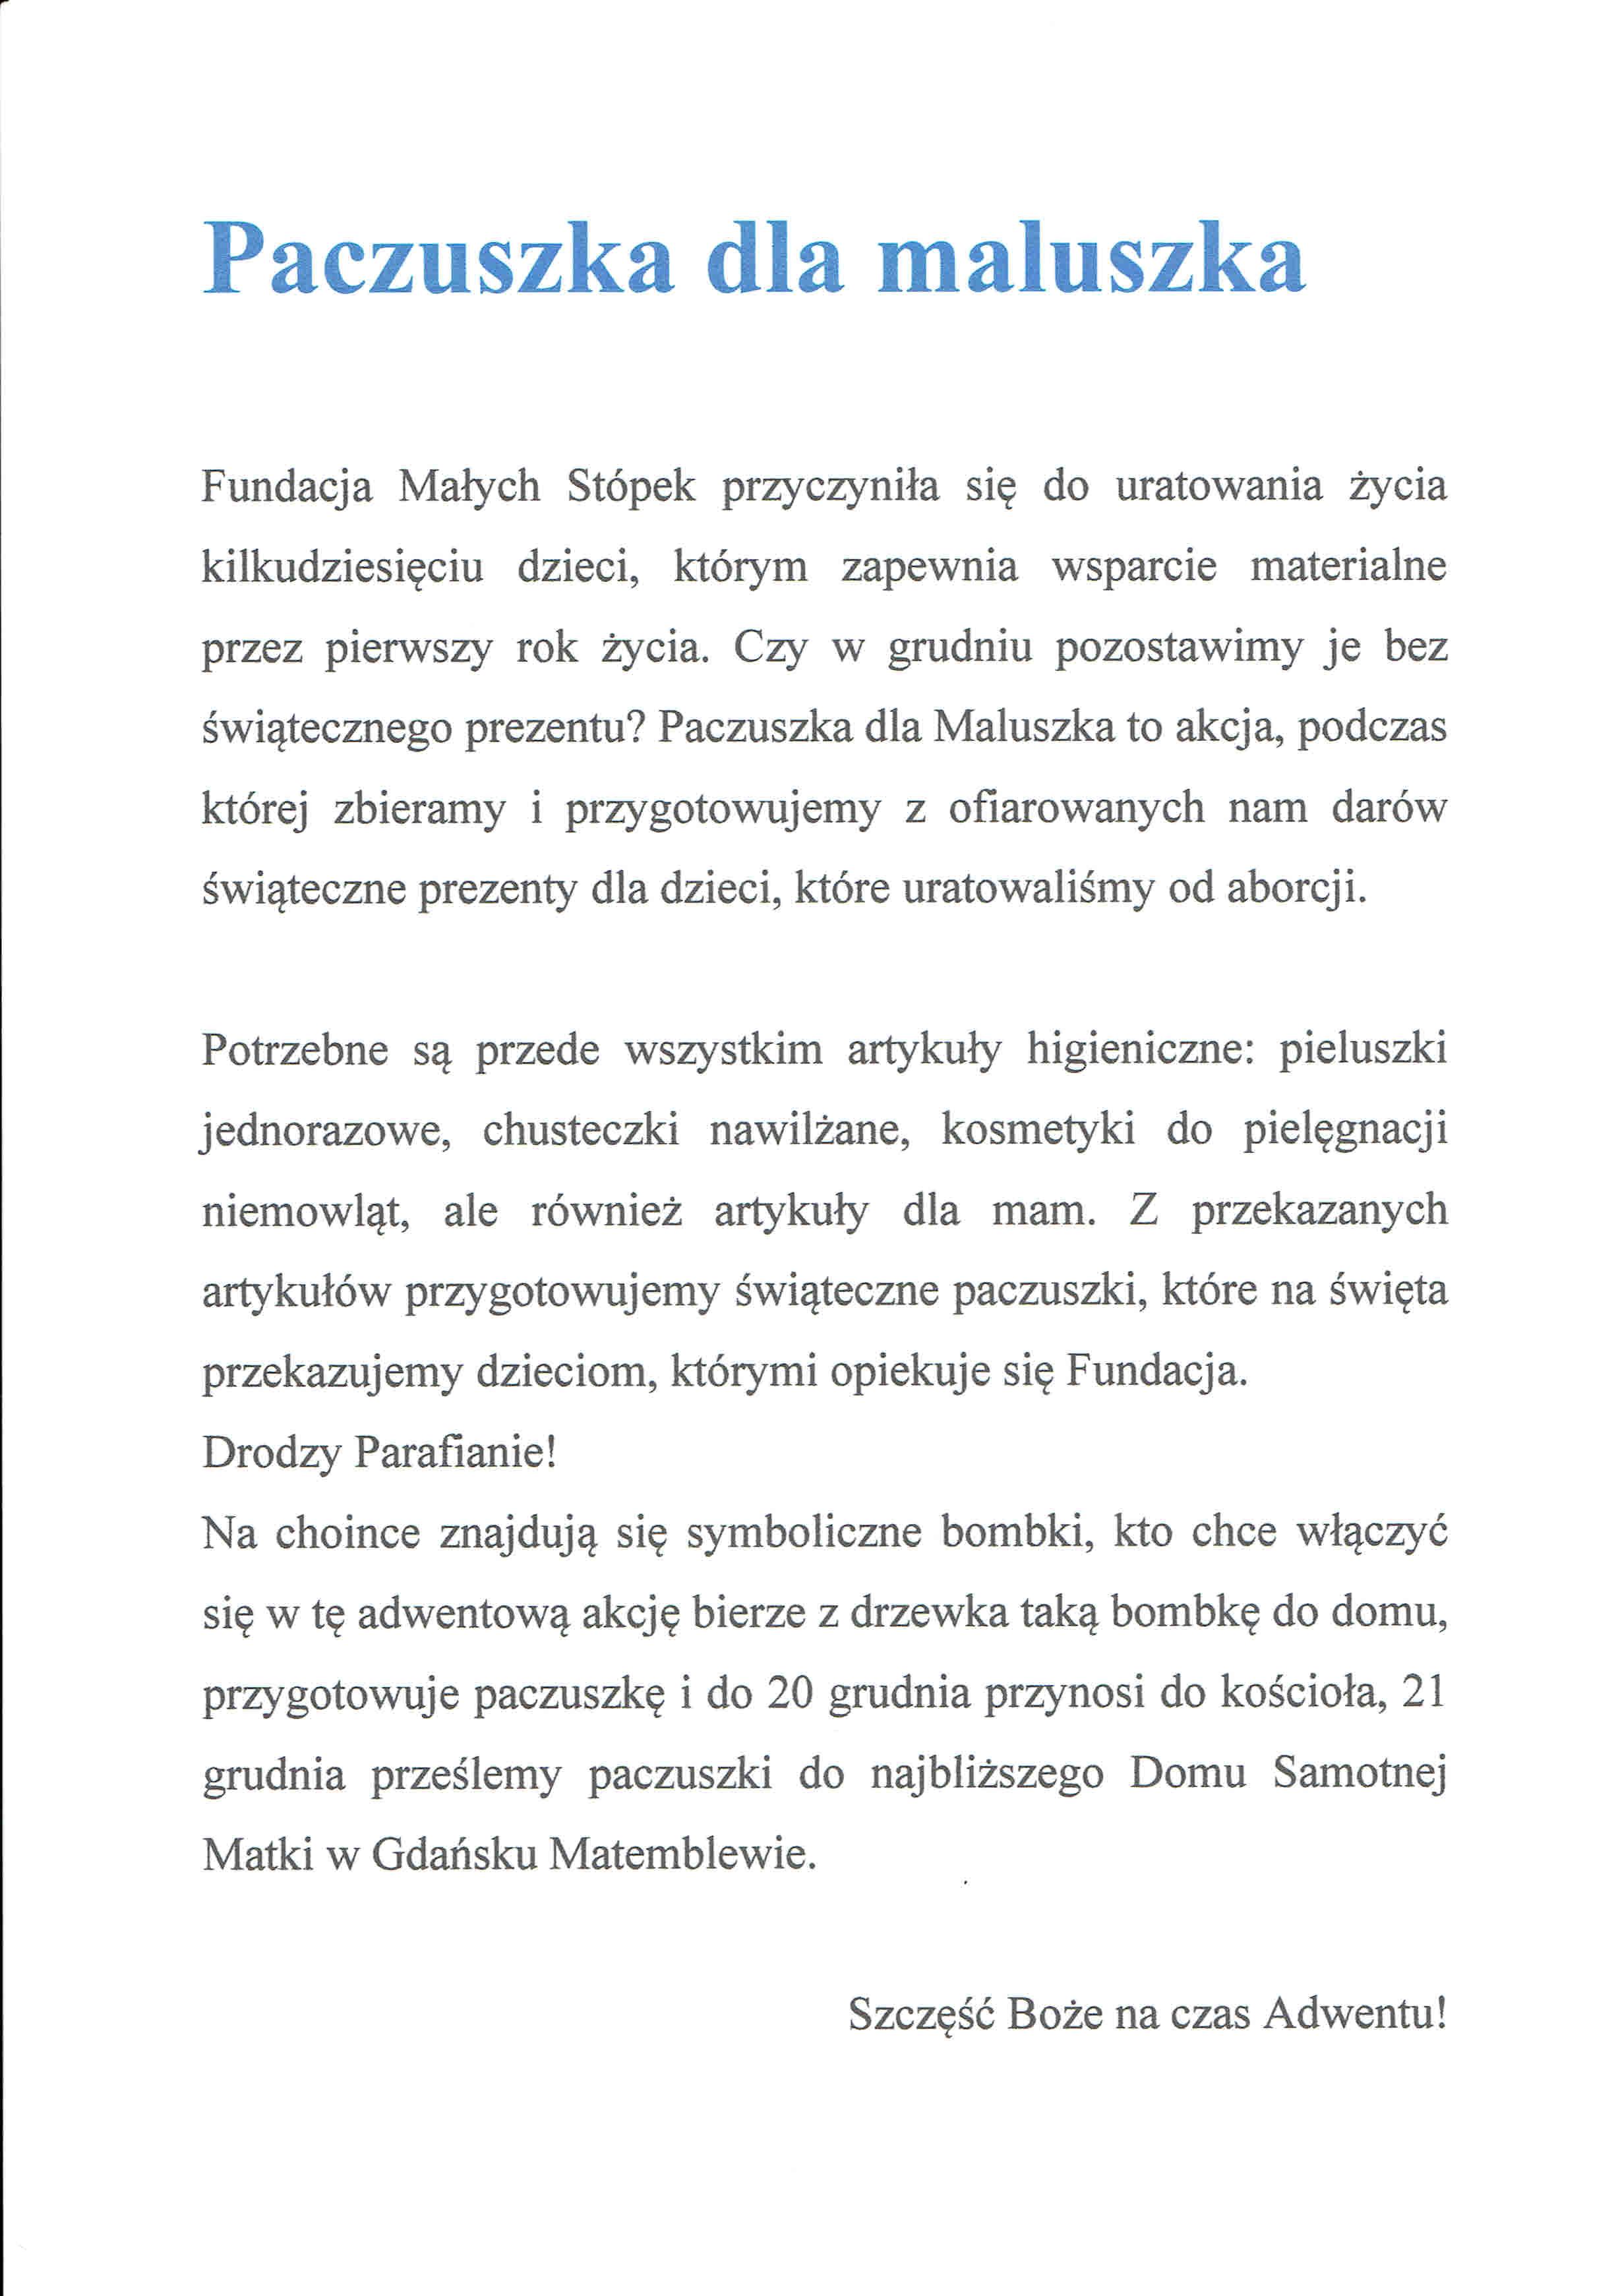 paczuszka20191130